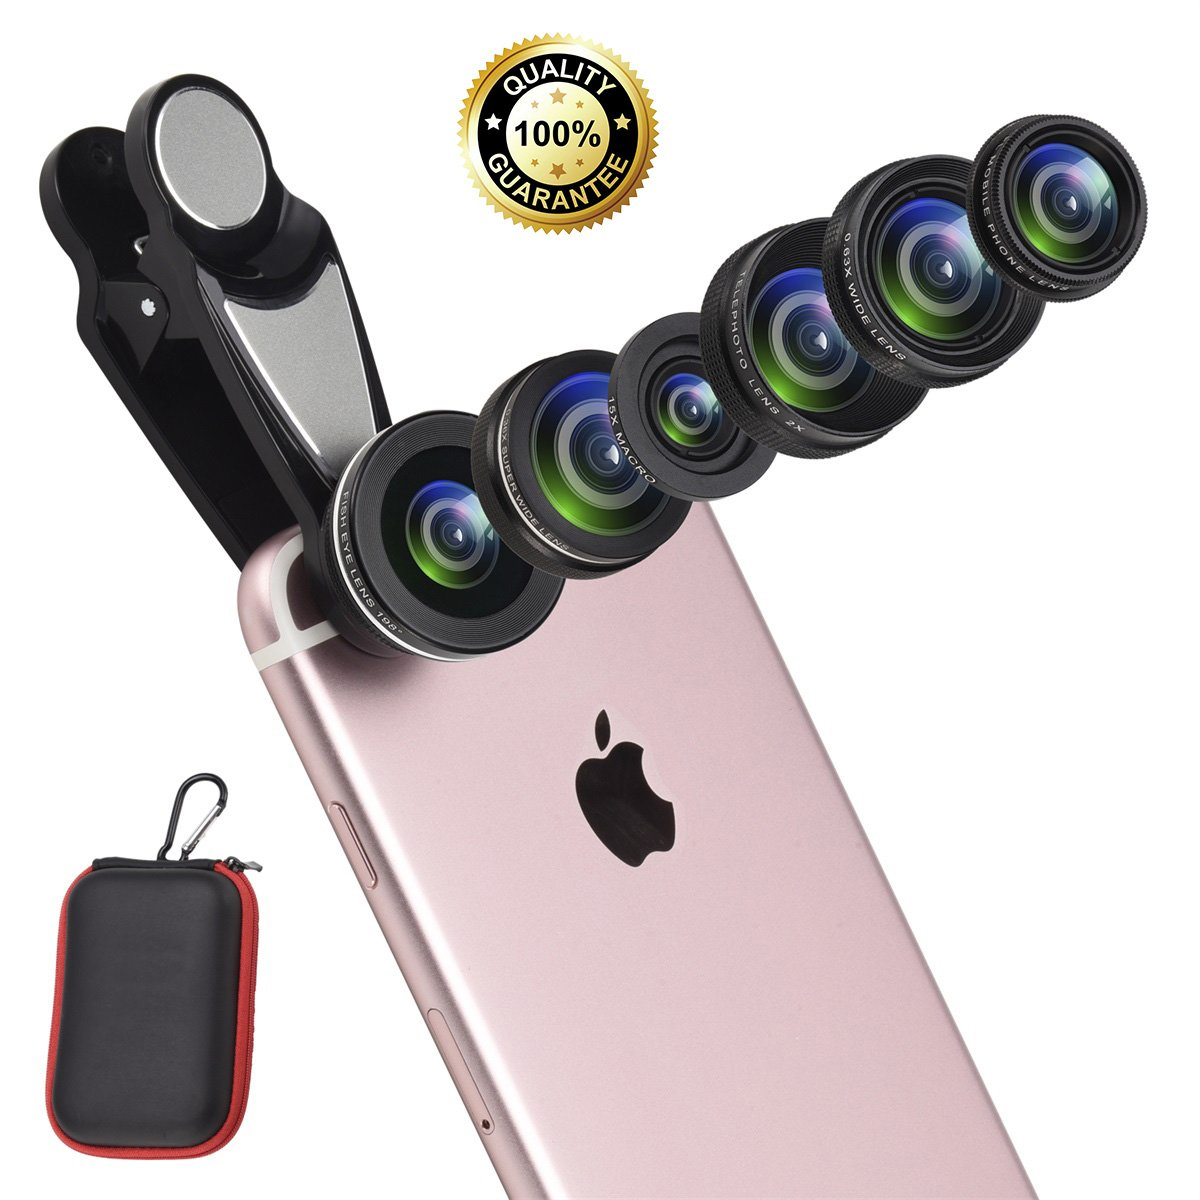 7 in 1 Cell Phone Lens Kit with Case, Super Fisheye Lens + 0.63x Wide Angle lens + 0.36x Super Wide Angle Lens + 15x Macro Lens + 2x Telephoto Lens+ Kaleidoscope + CPL Lens